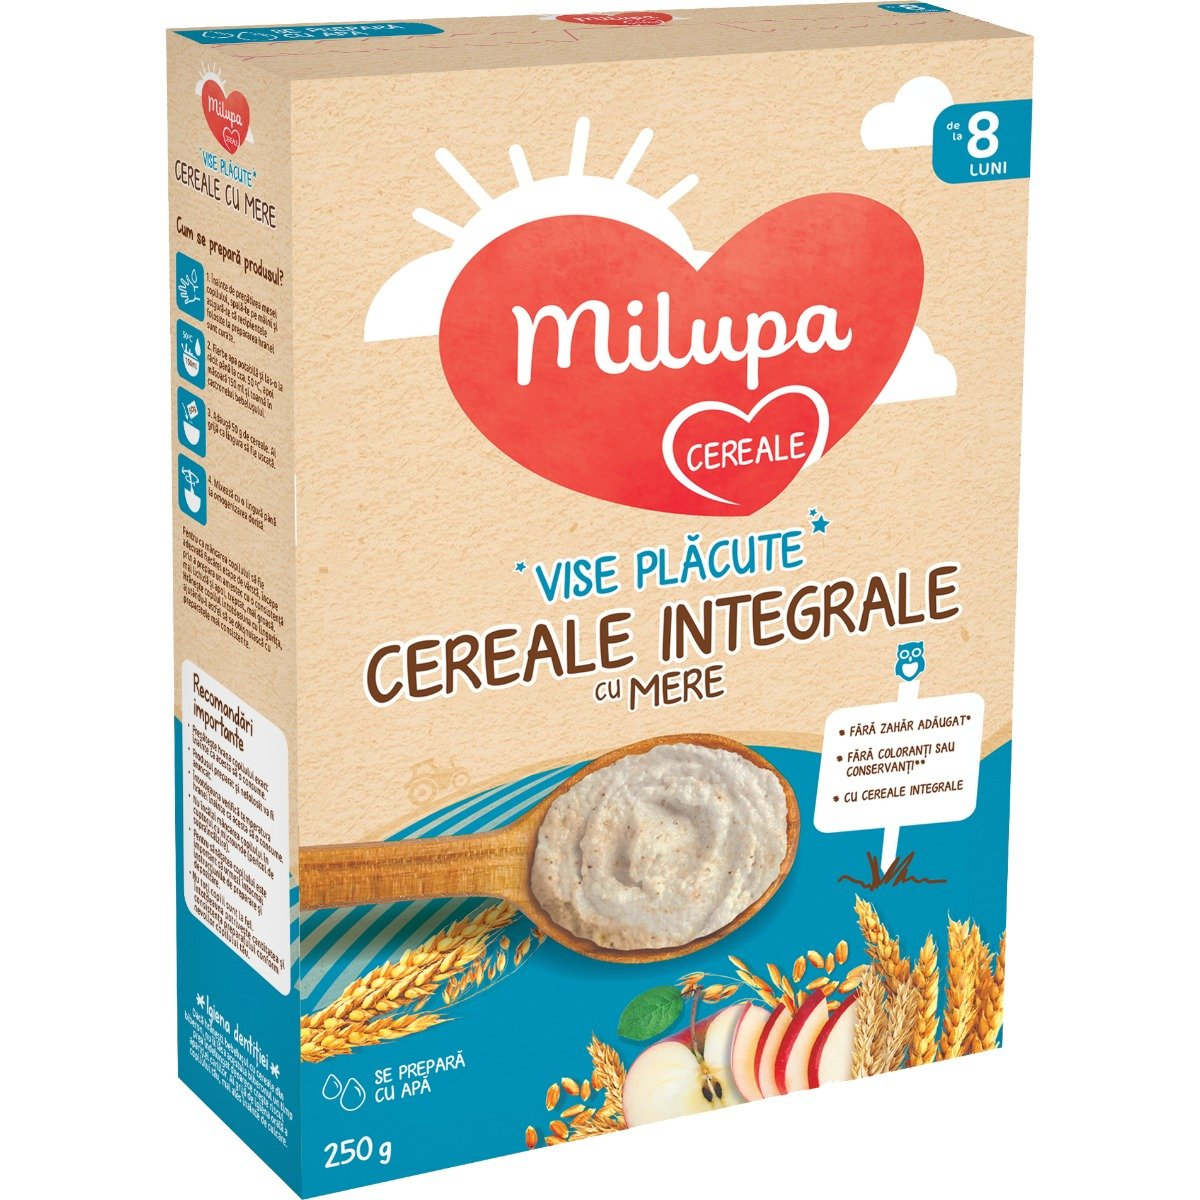 Cereale integrale cu mere Milupa, Vise placute, 250 g imagine